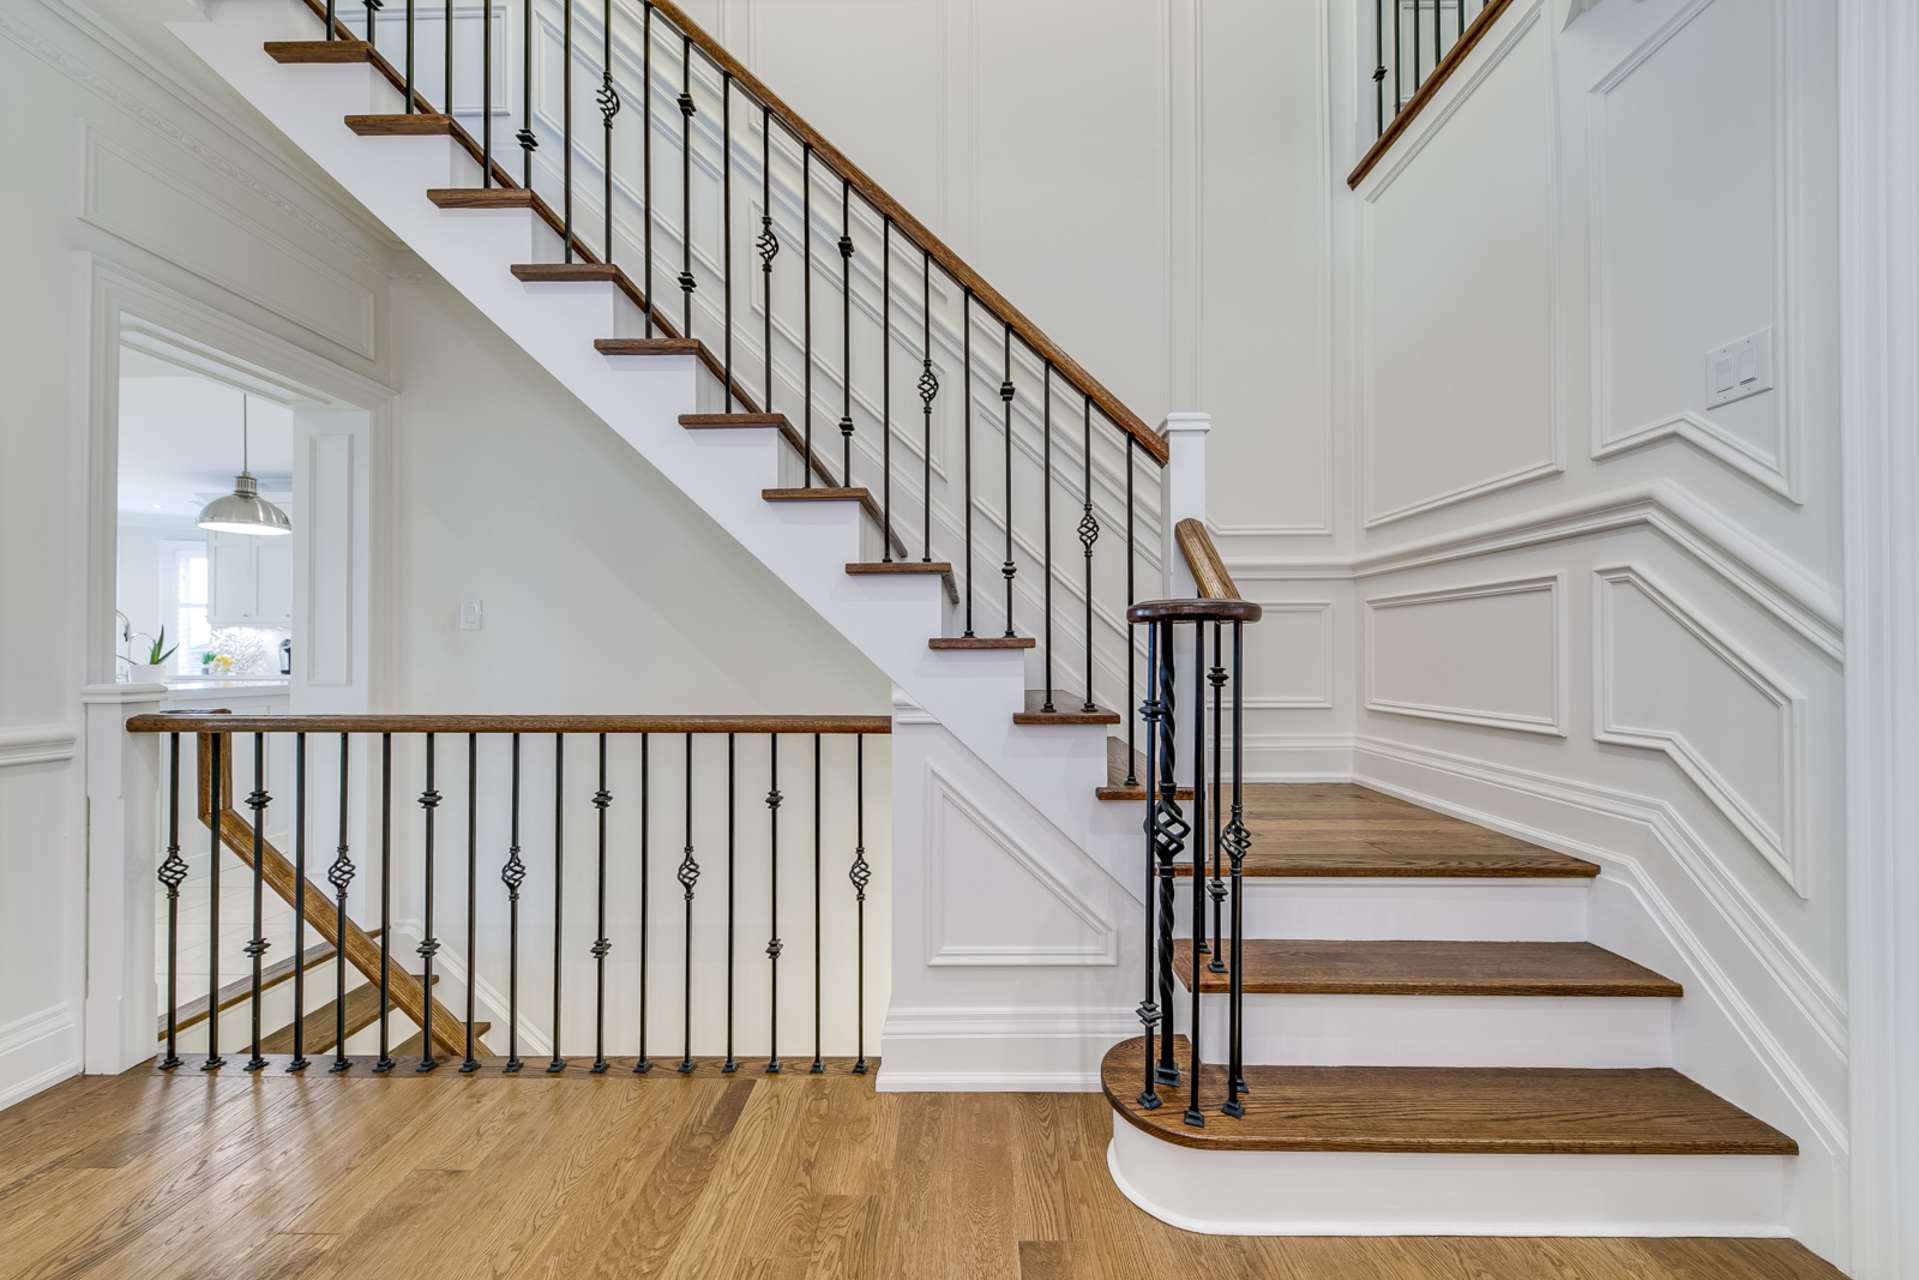 Stairs - 2415 Lyndhurst Dr, Oakville - Elite3 & Team at 2415 Lyndhurst Drive, Iroquois Ridge North, Oakville